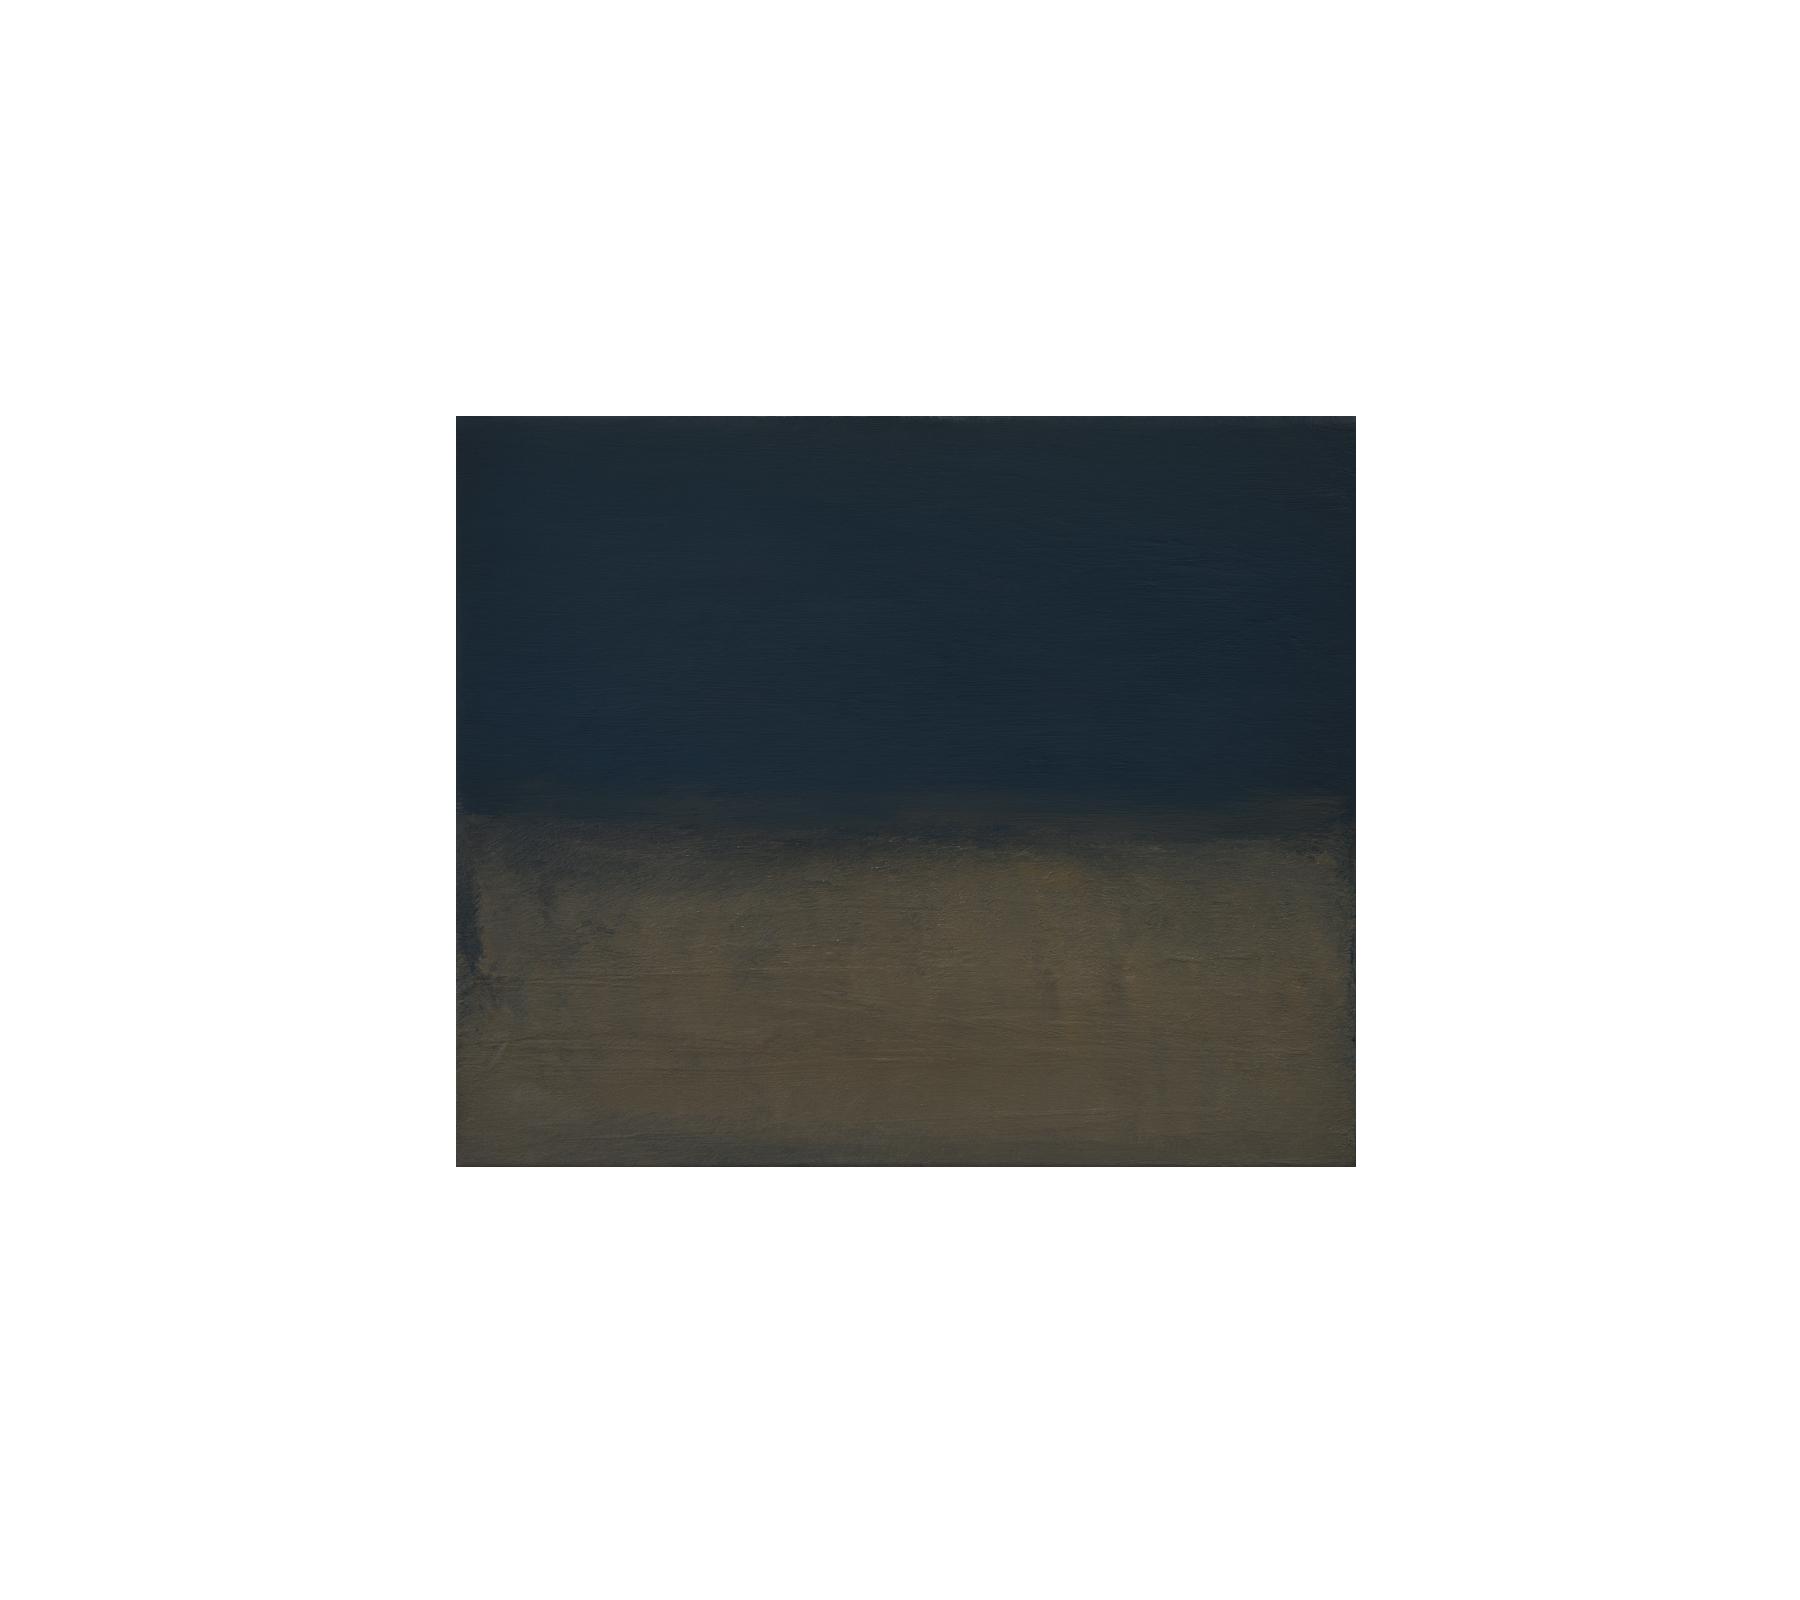 Untitled 2020 50x60cm